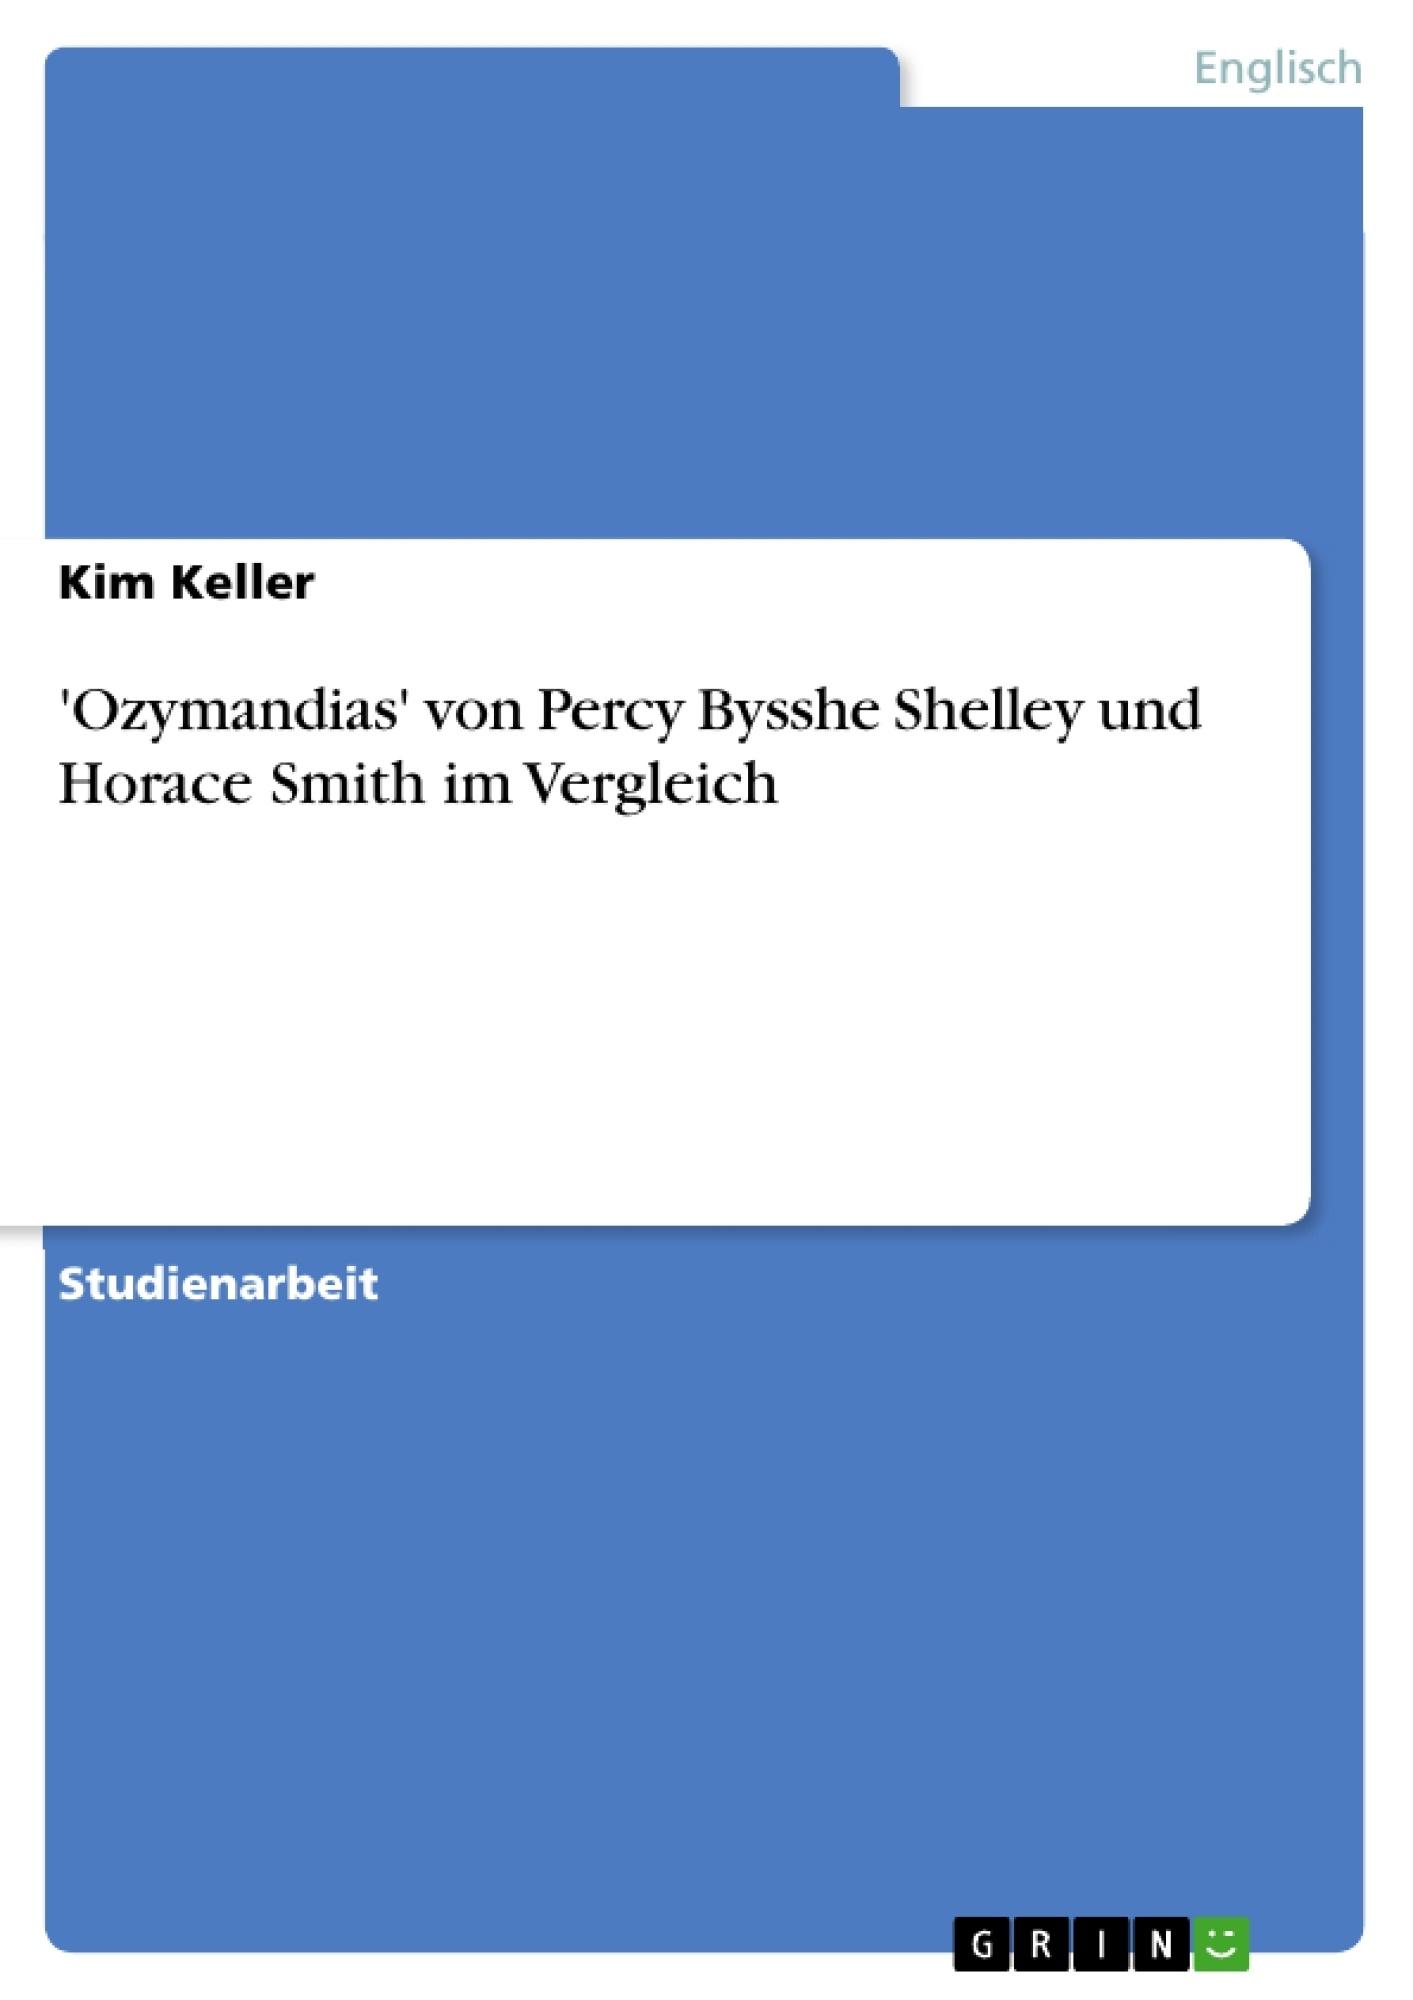 Titel: 'Ozymandias'  von Percy Bysshe Shelley und Horace Smith  im Vergleich